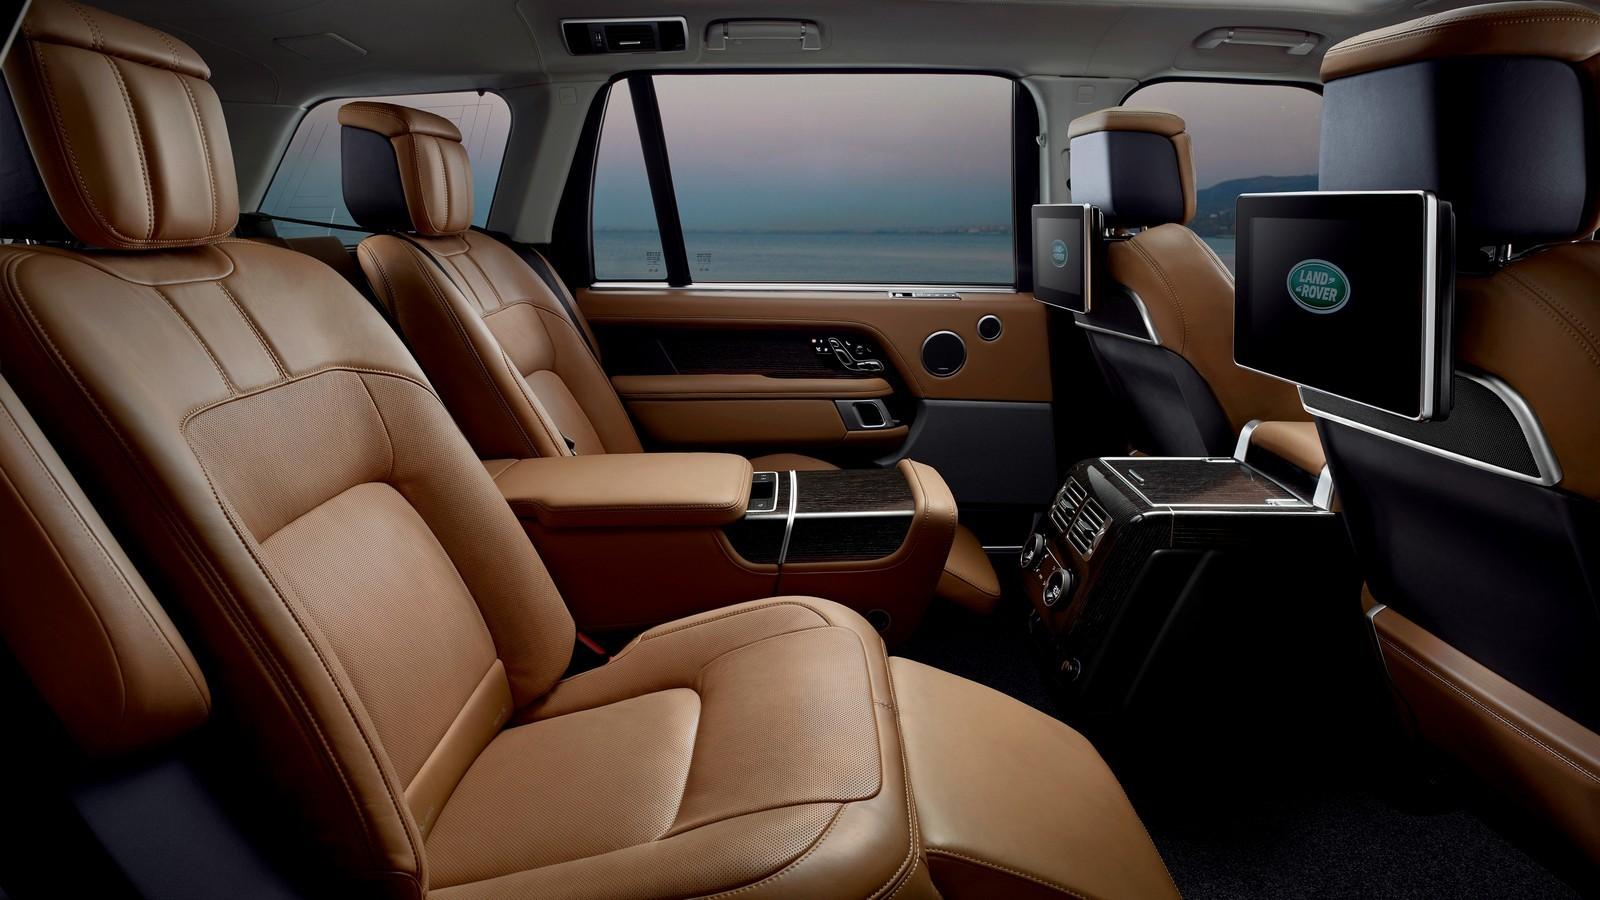 Range Rover SVAutobiography DYNAMIC  Плагин-гибридная модификация Range Rover получила индекс P400